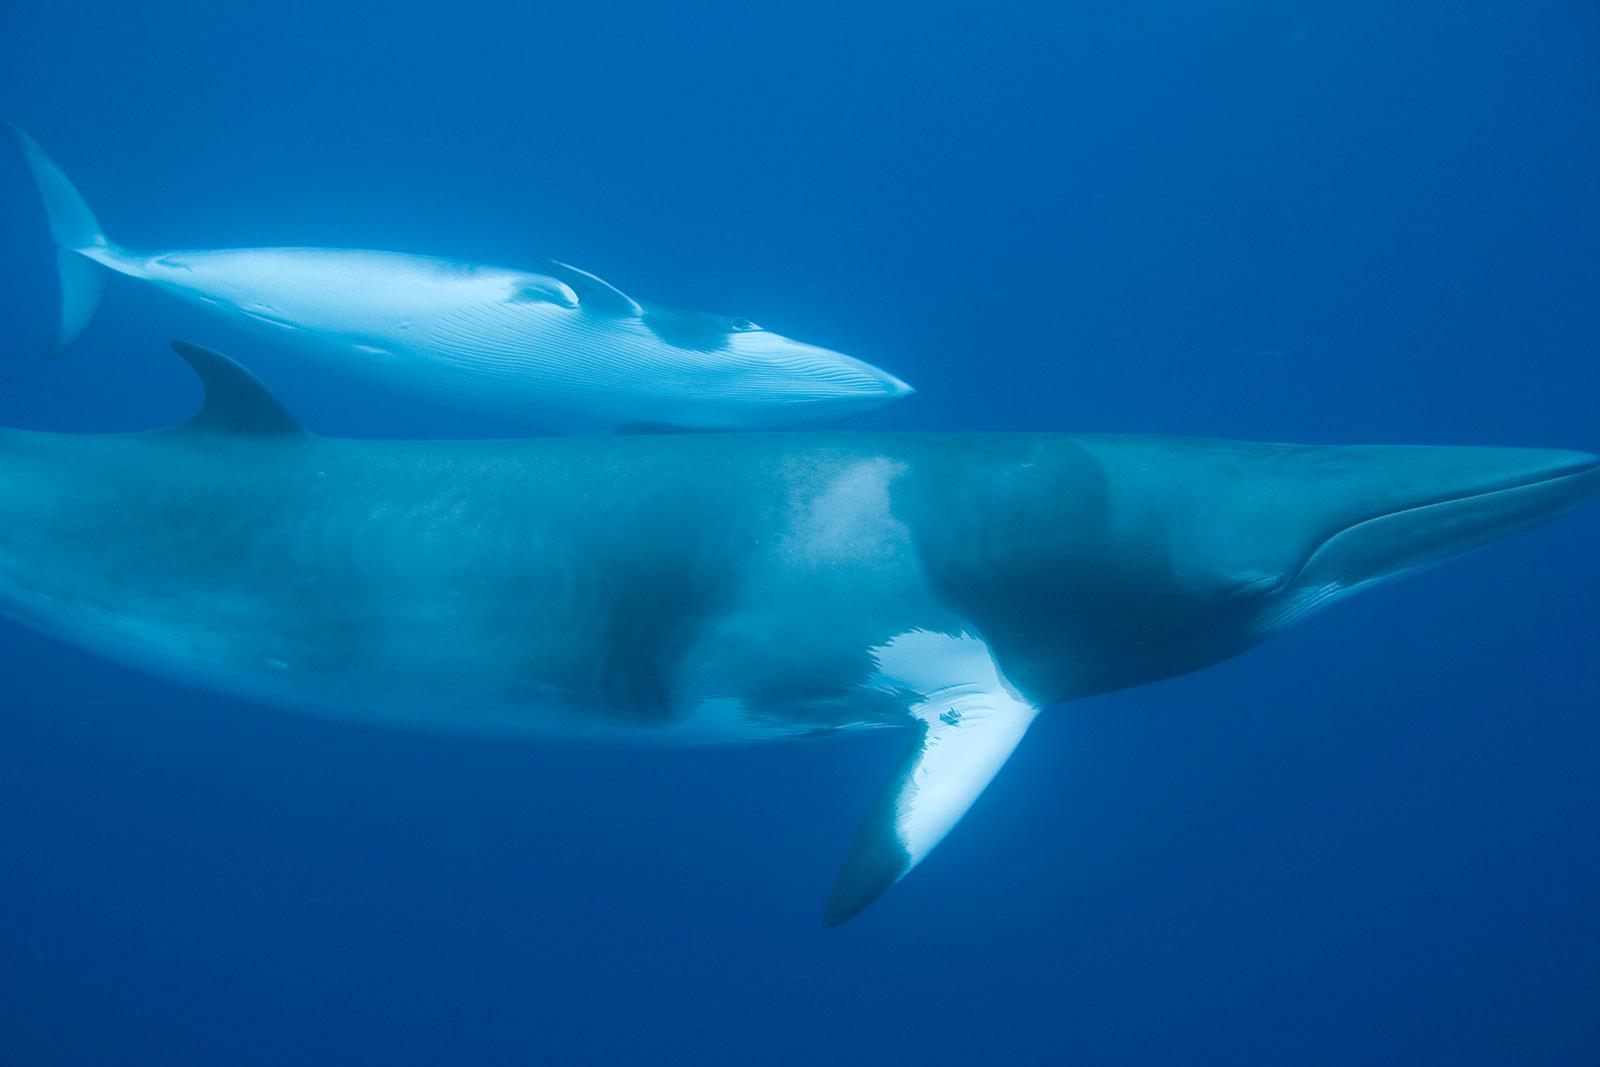 Helfen Sie uns, den Walfang in Norwegen zu stoppen!